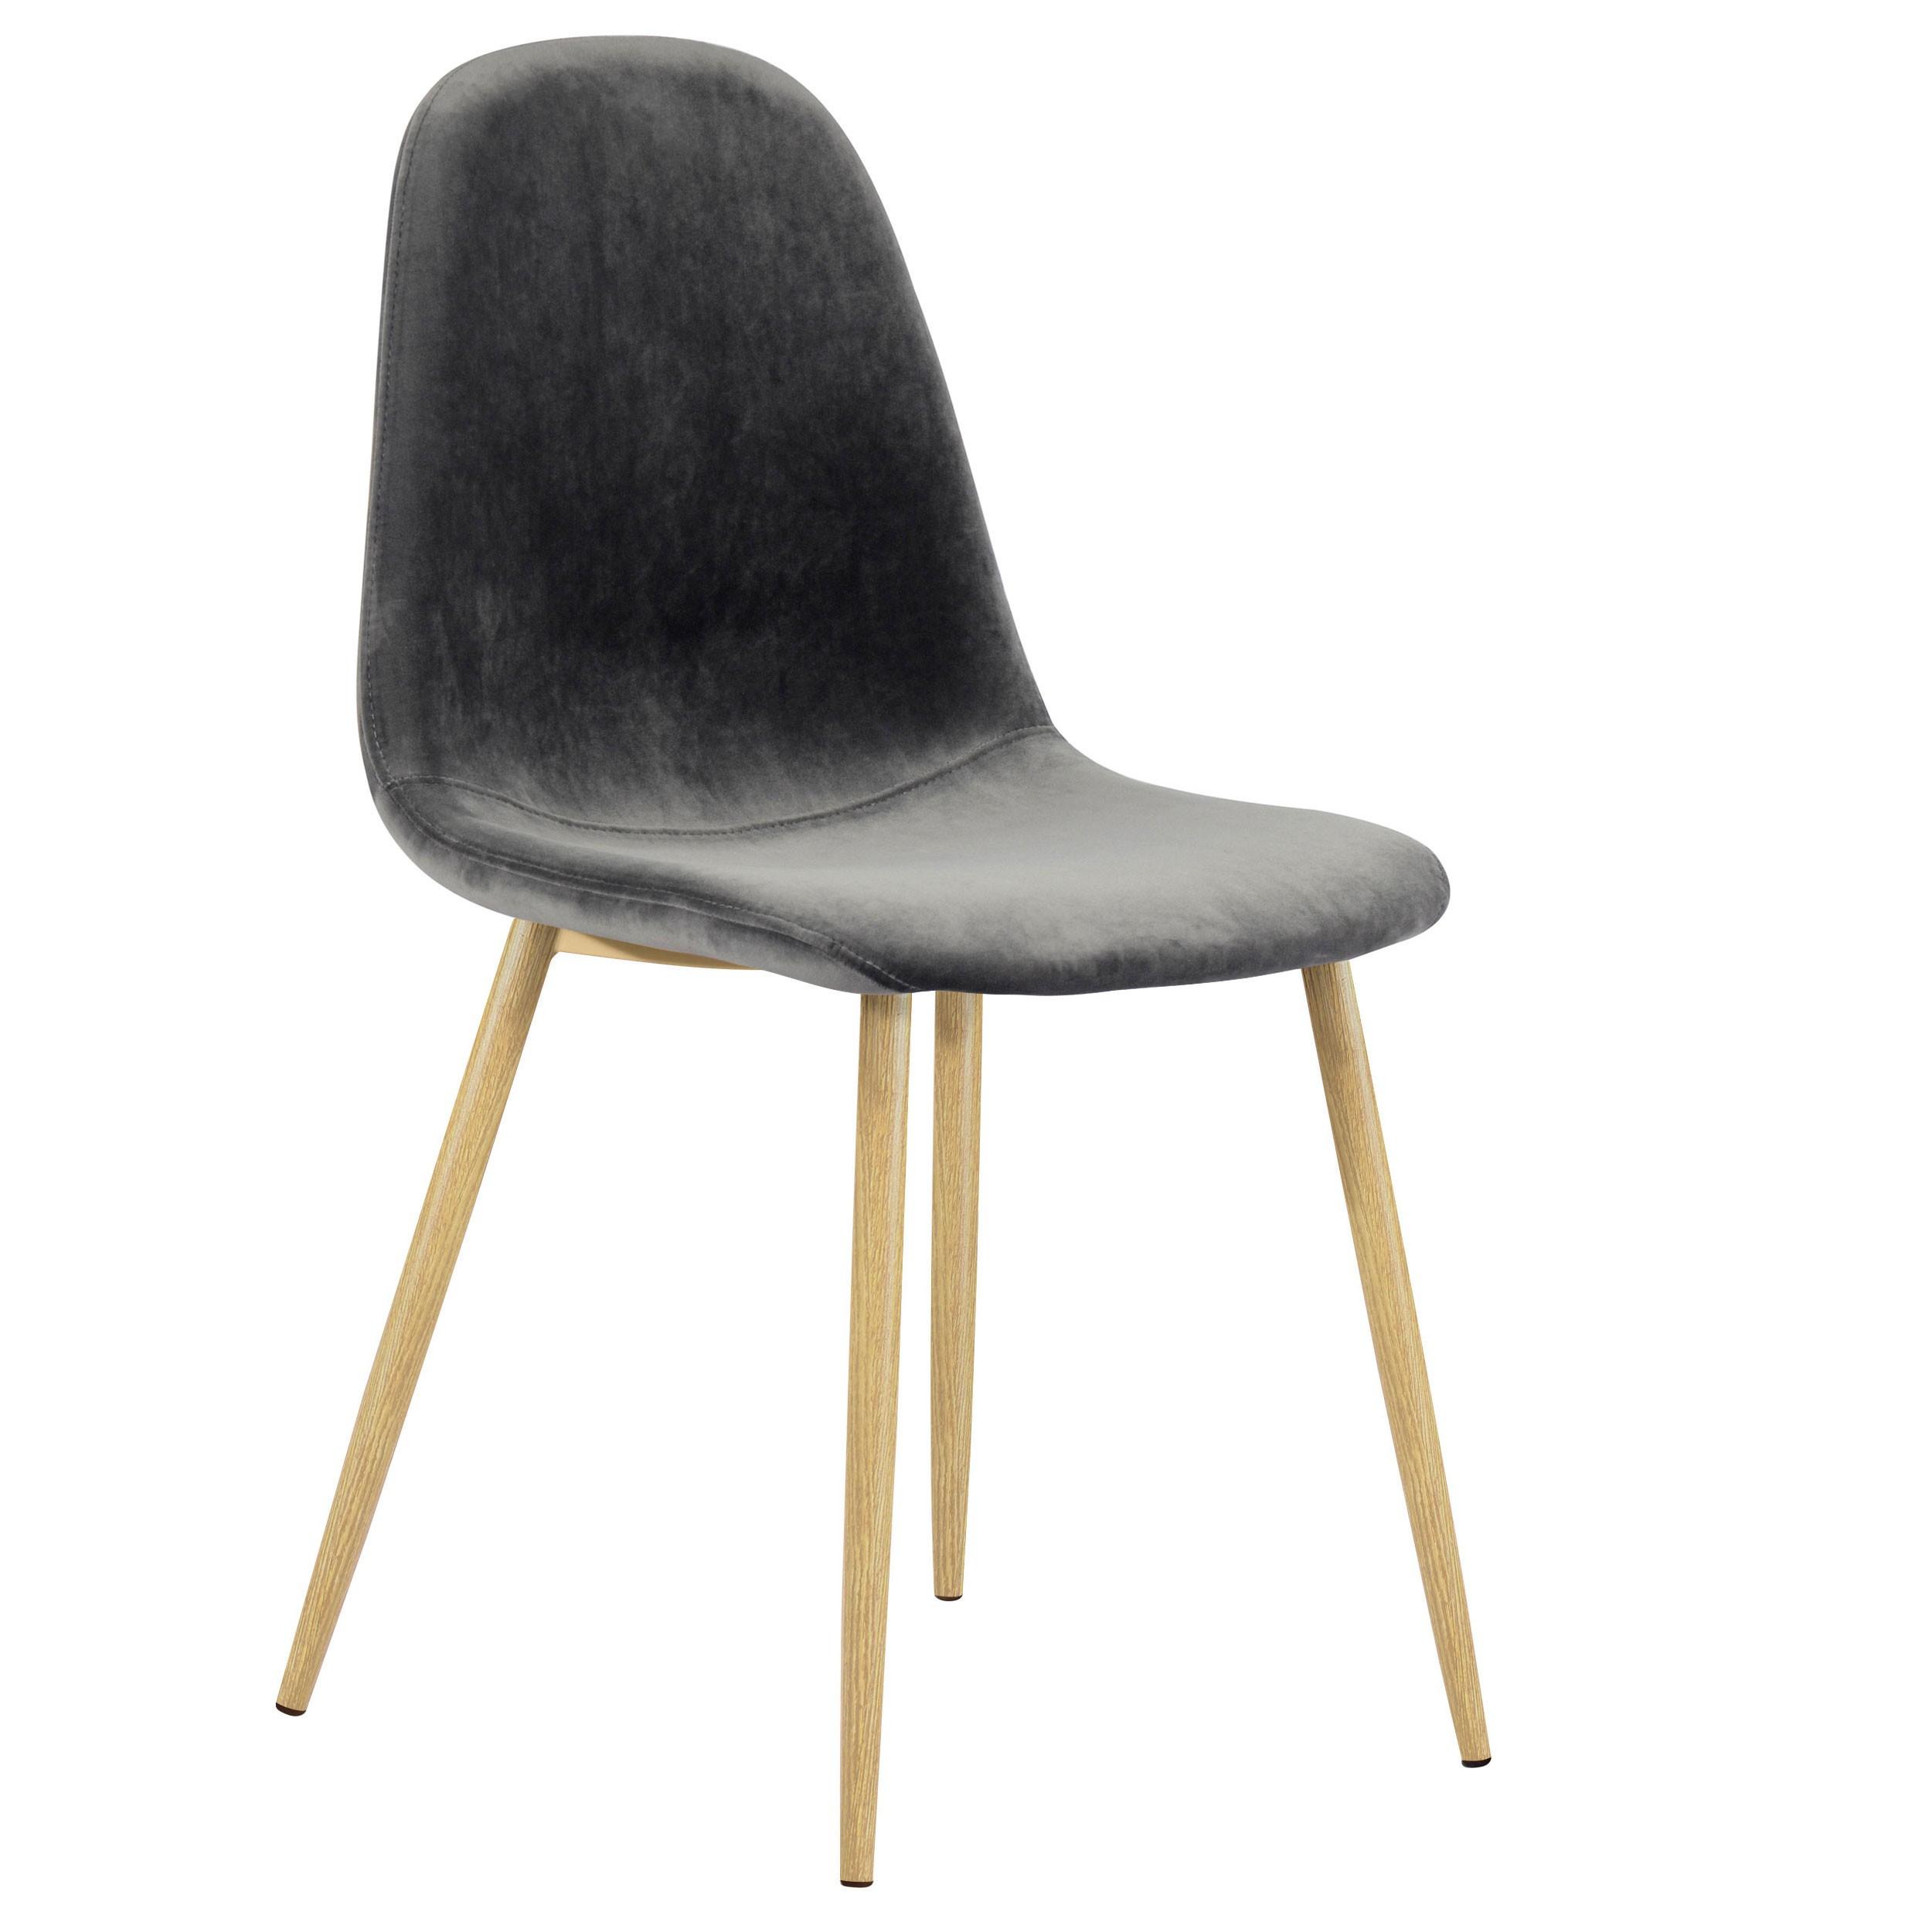 acheter des chaises pas cher elegant acheter des chaises pas cher with acheter des chaises pas. Black Bedroom Furniture Sets. Home Design Ideas